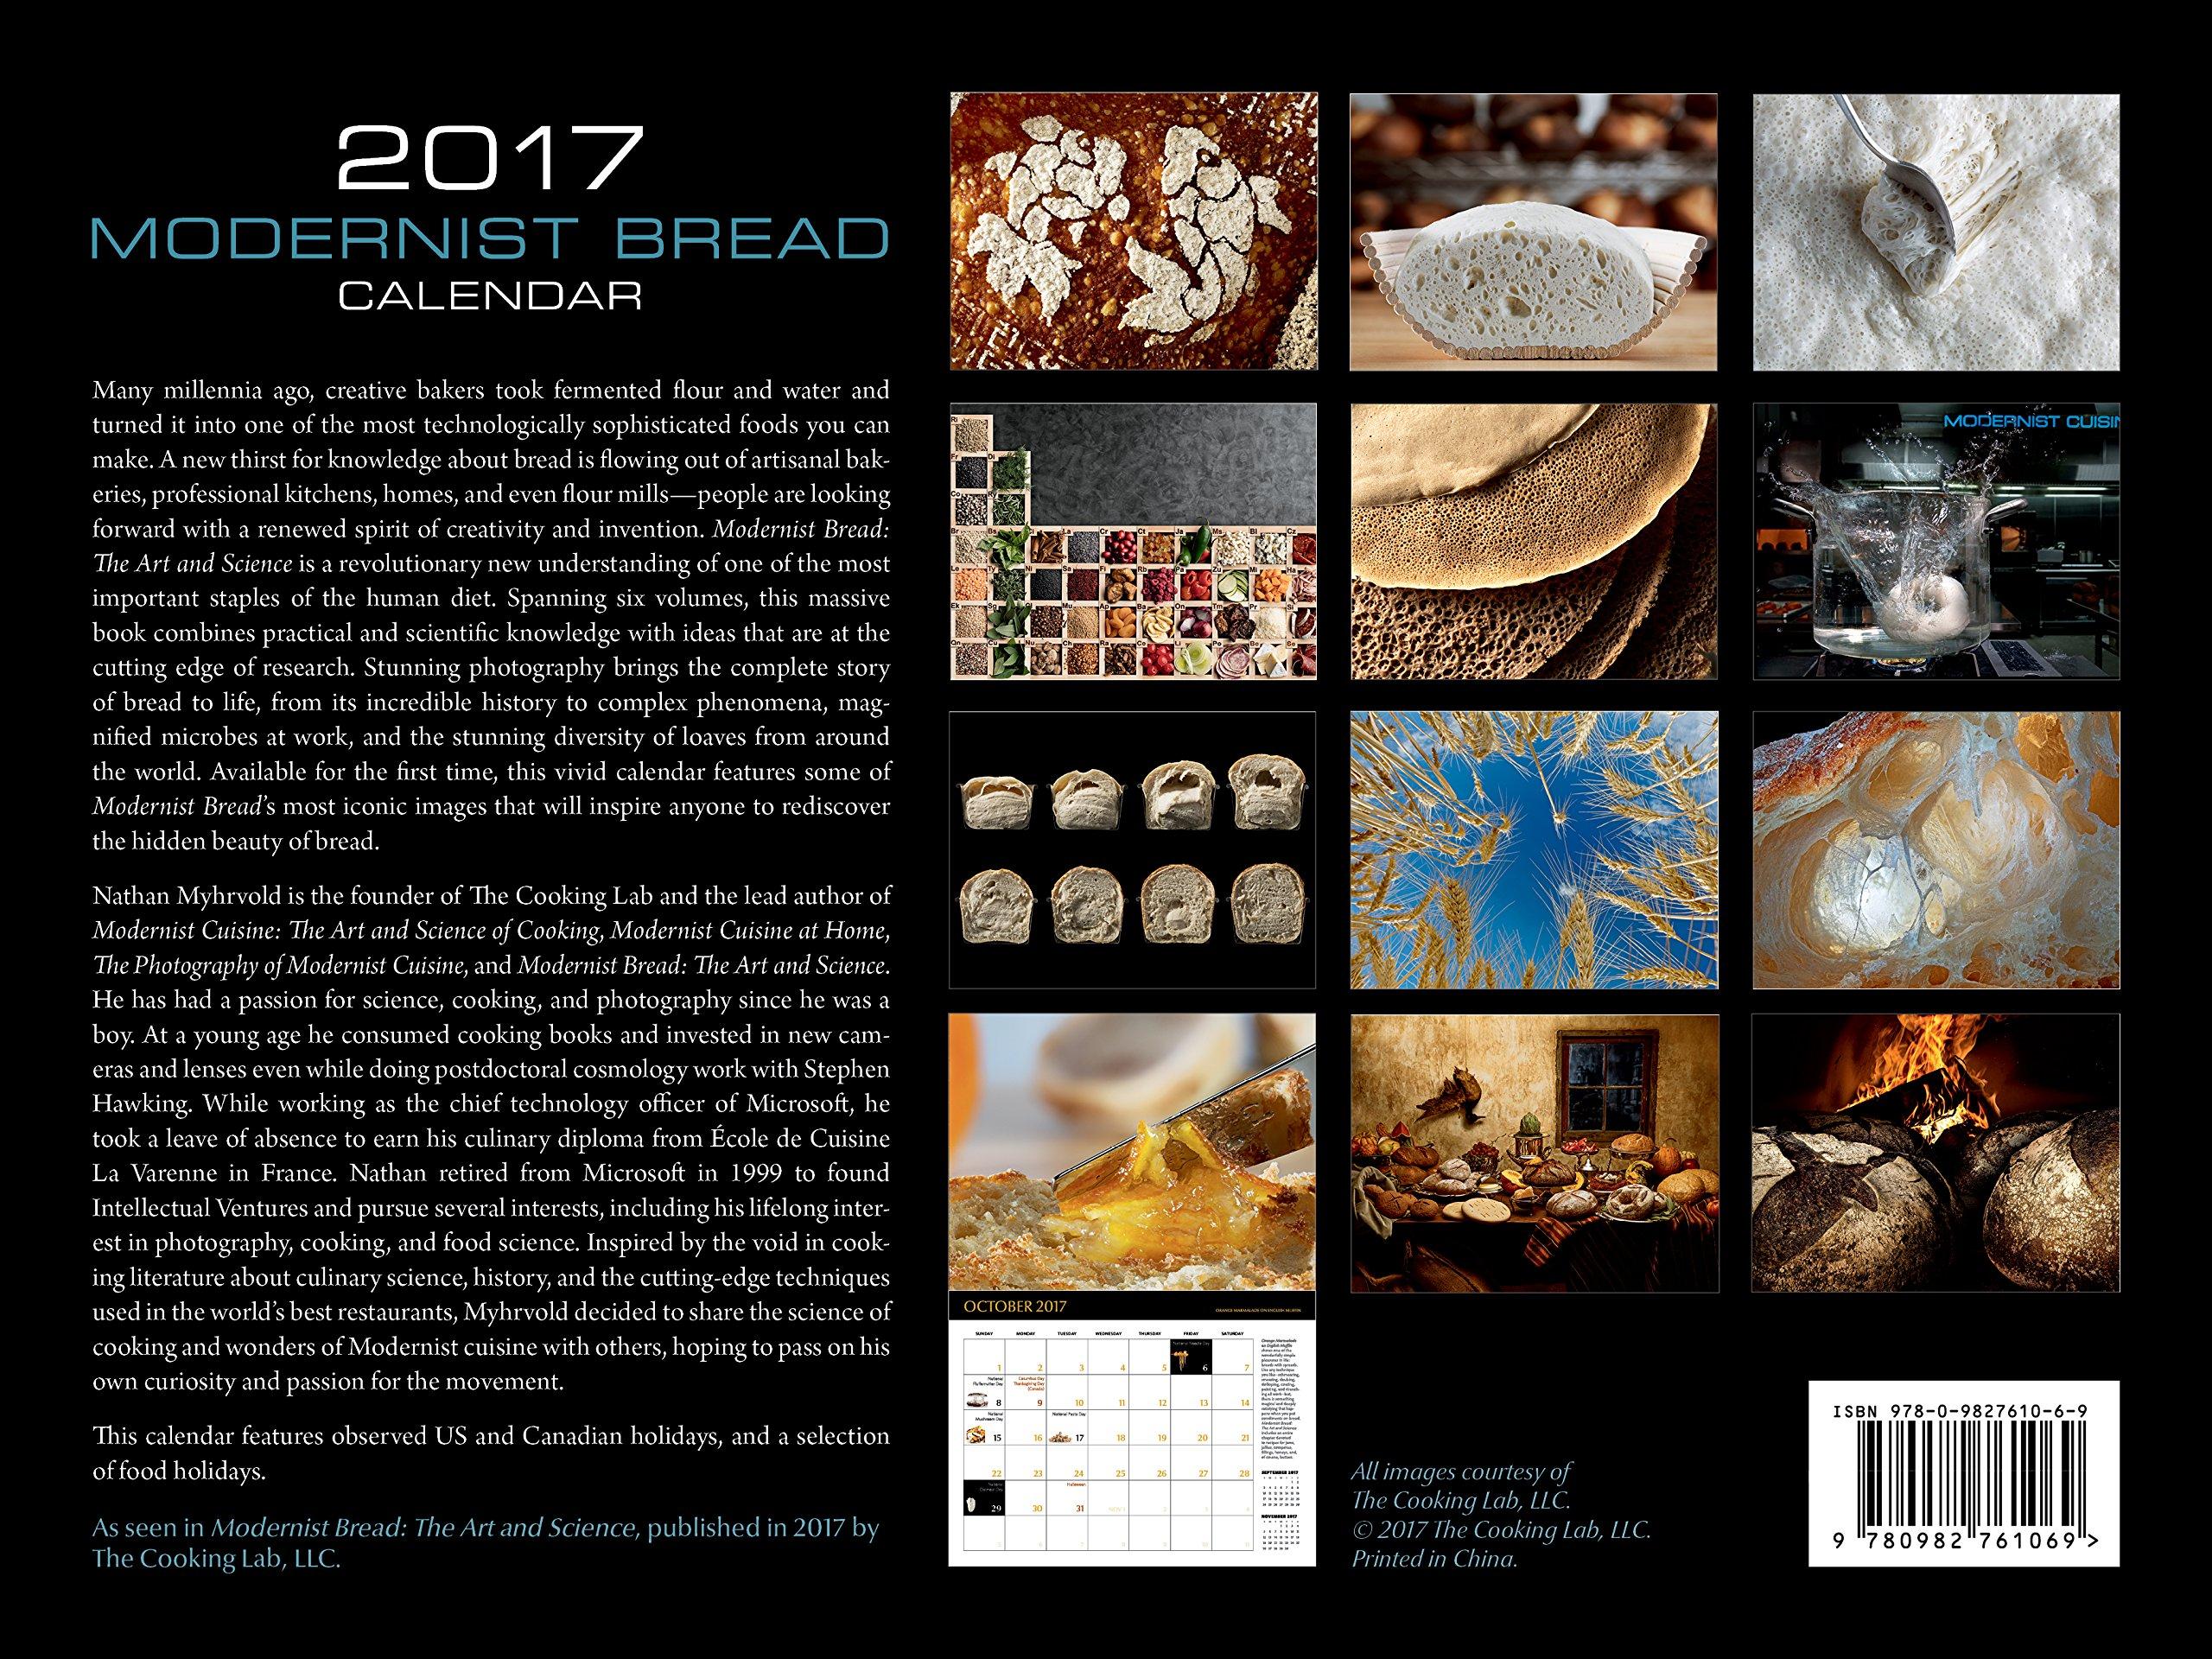 Modernist Bread 2017 Wall Calendar: Nathan Myhrvold: 9780982761069:  Amazon.com: Books